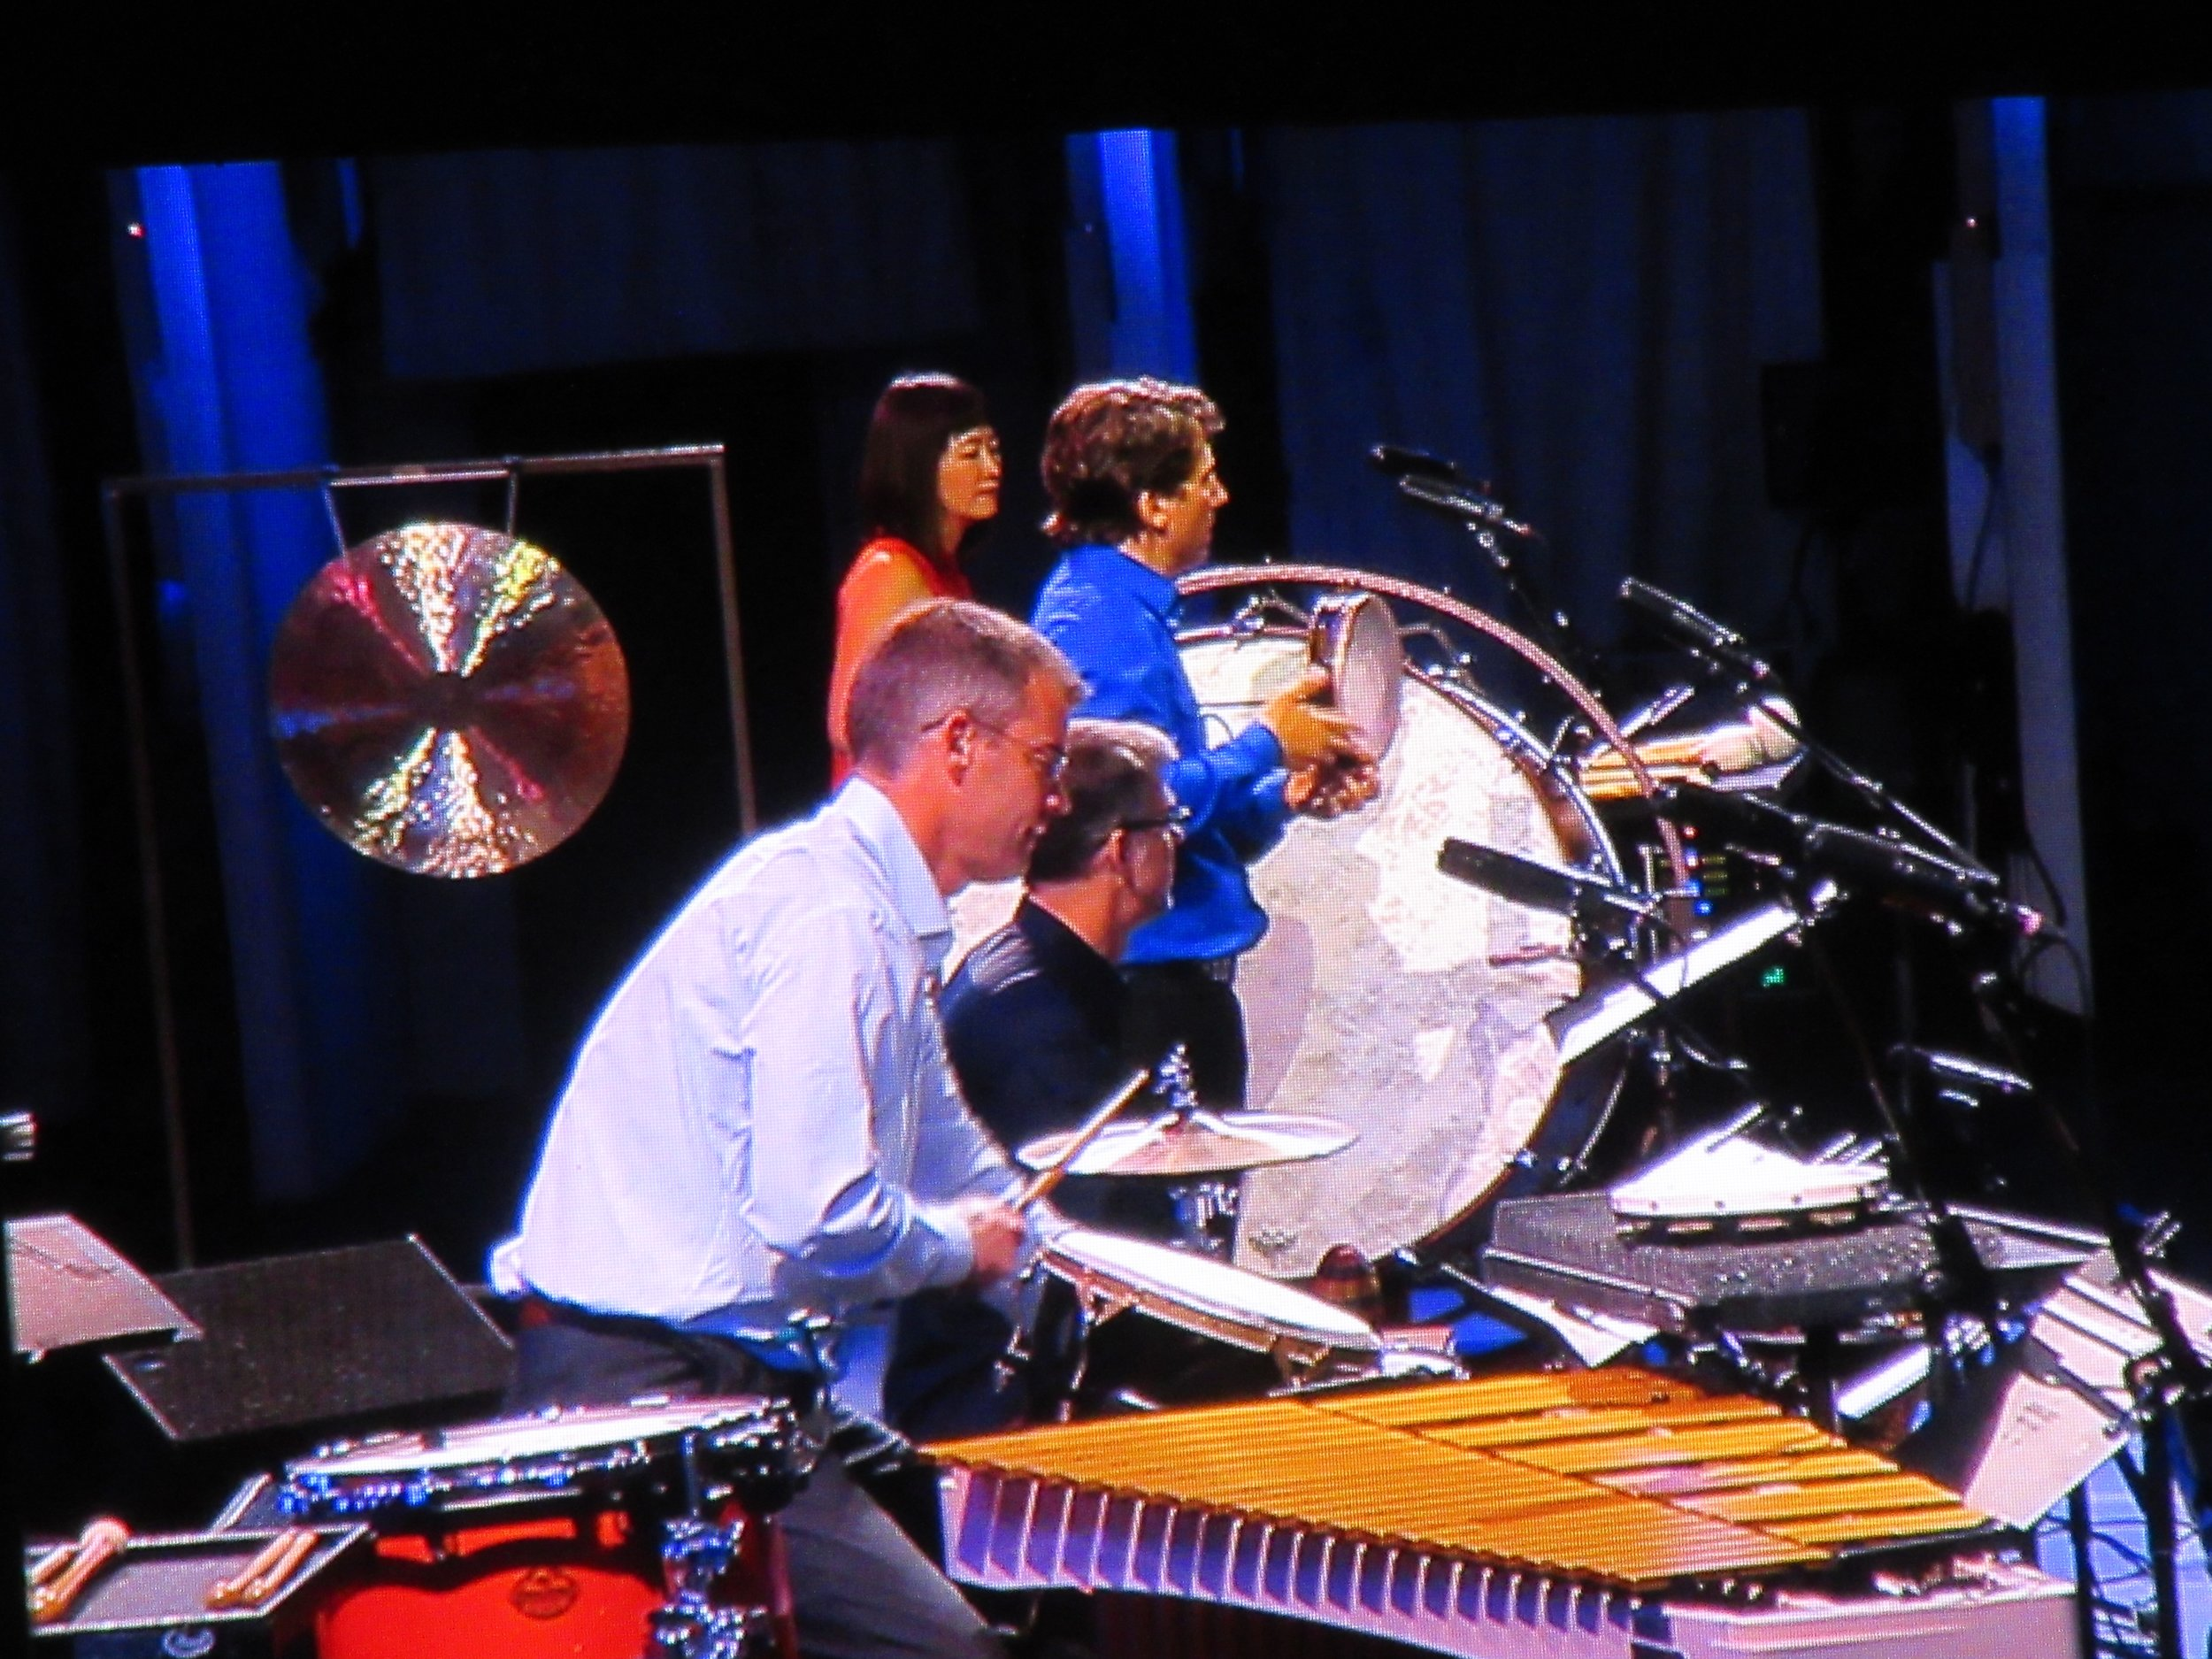 Joe, Haruka, Mark and Shane. First tour with four!